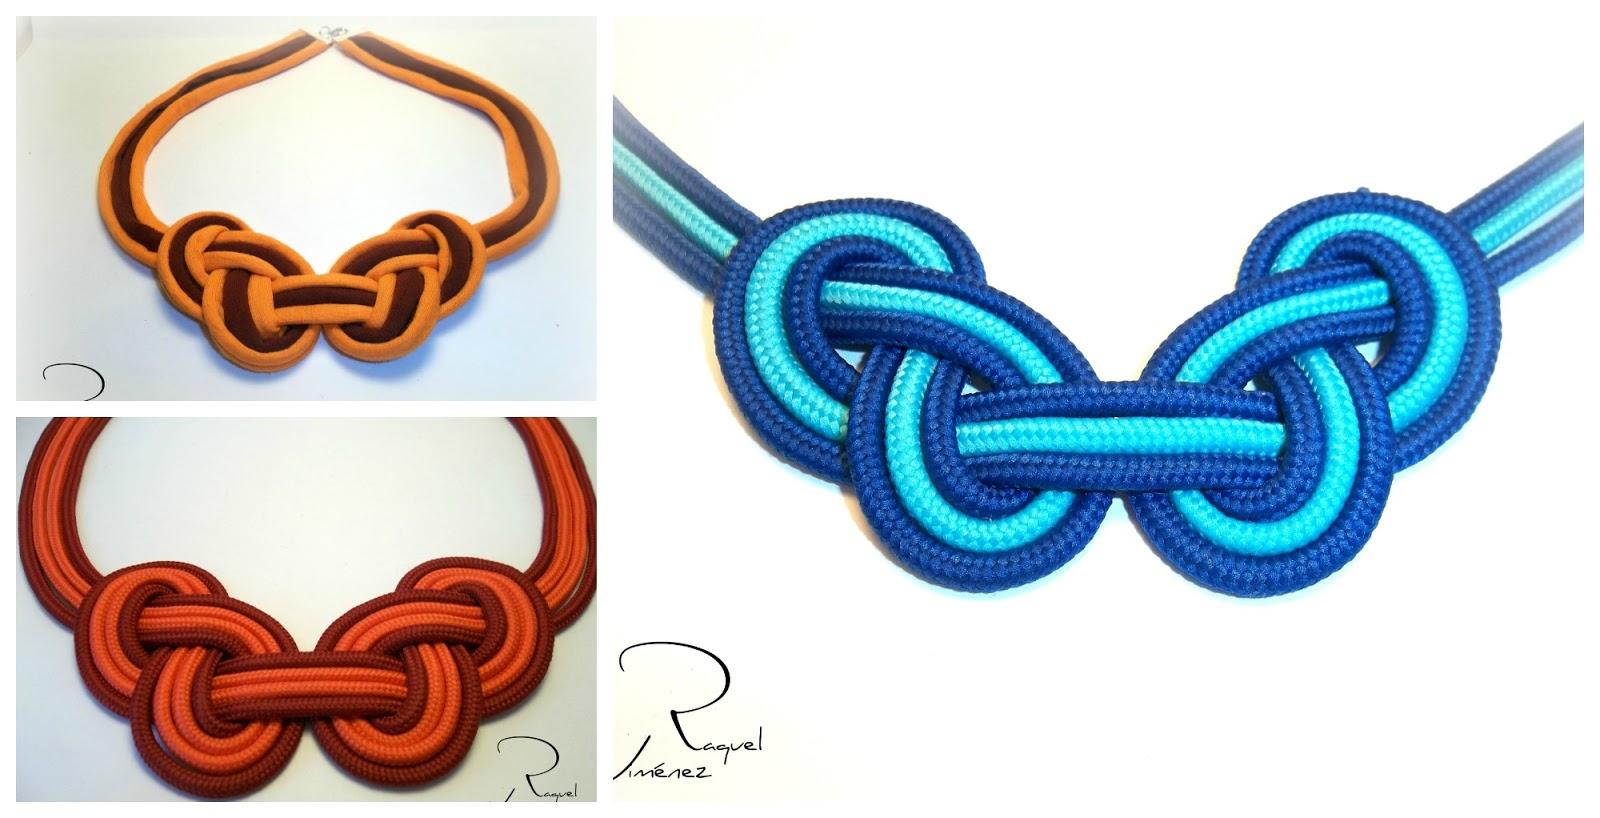 Como hacer un collar con nudo bicolor en trapillo o con cord n raquel jim nez artesan a - Como hacer alfombras de nudos ...